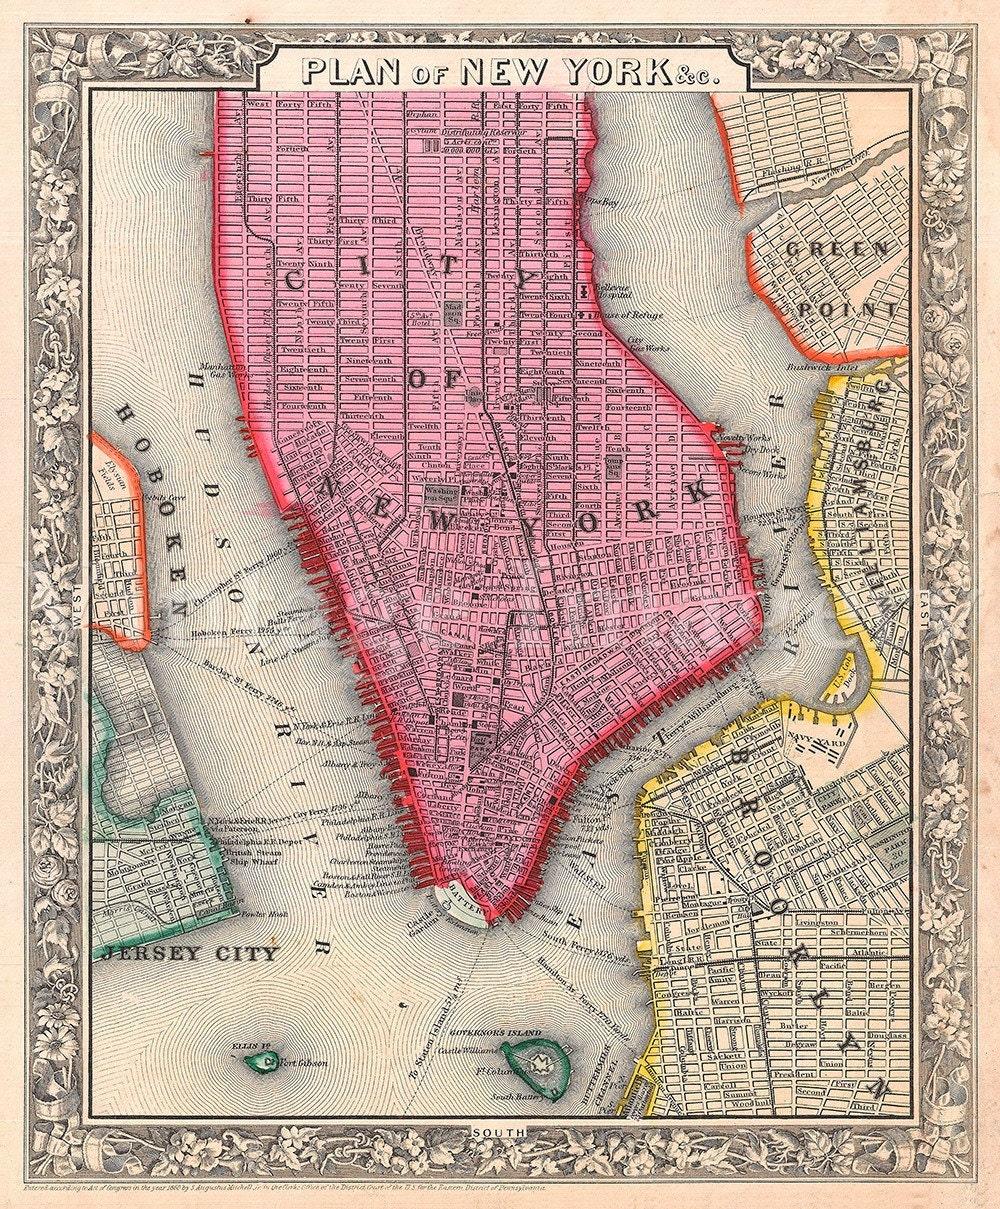 Old Map Of New York City  Antique Restoration Hardware Style - New york map restoration hardware